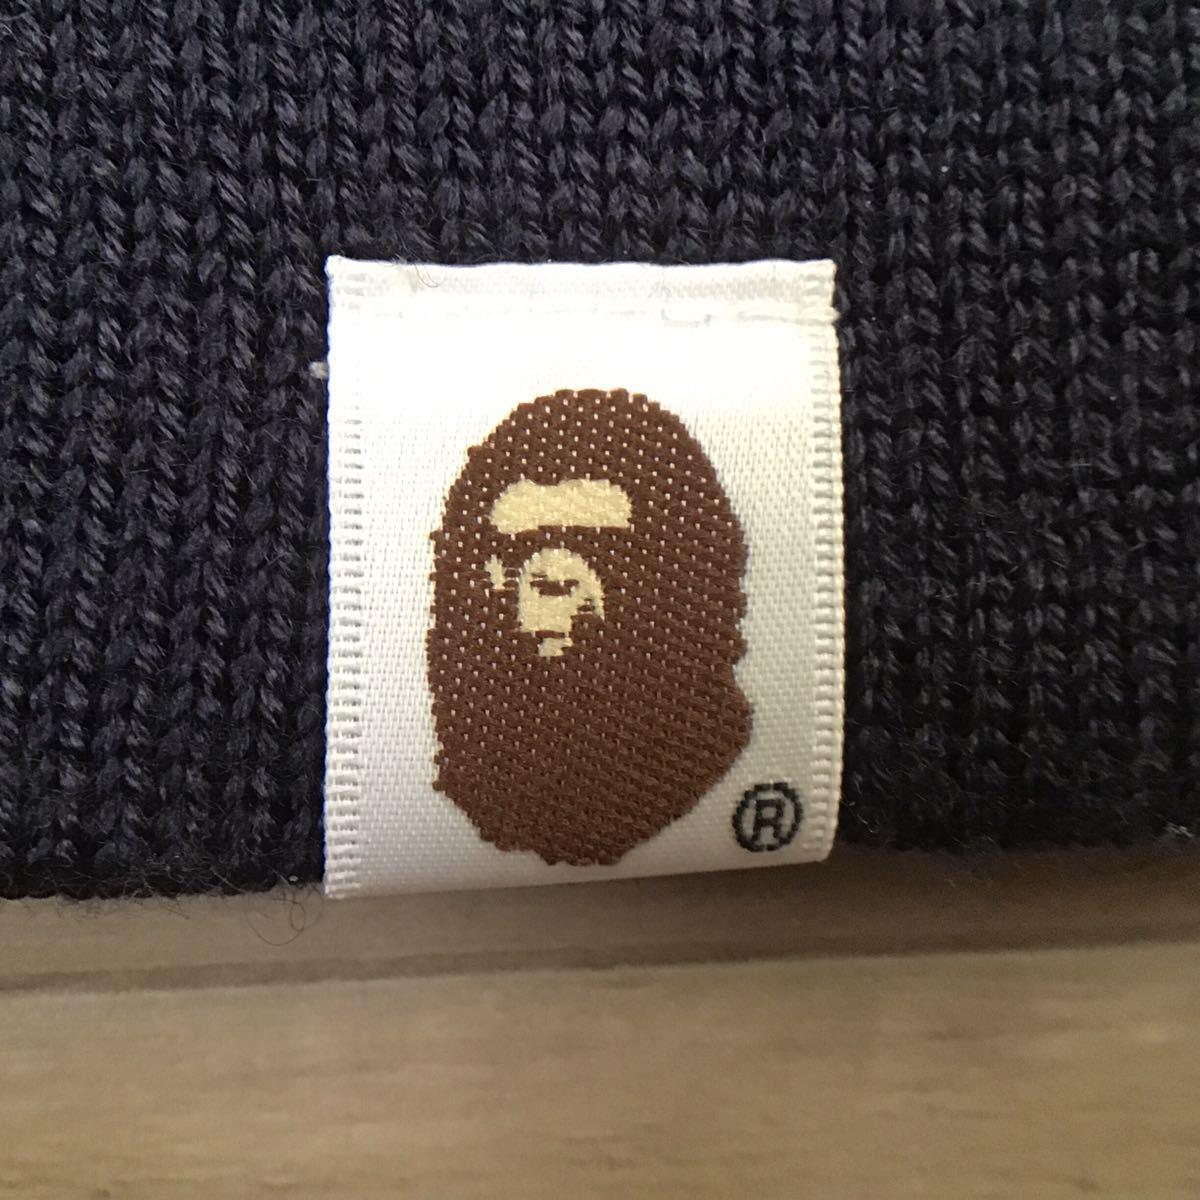 swarovski ape face ニット帽 ビーニー a bathing ape BAPE Beanie エイプ ベイプ アベイシングエイプ スワロフスキー 帽子 1470